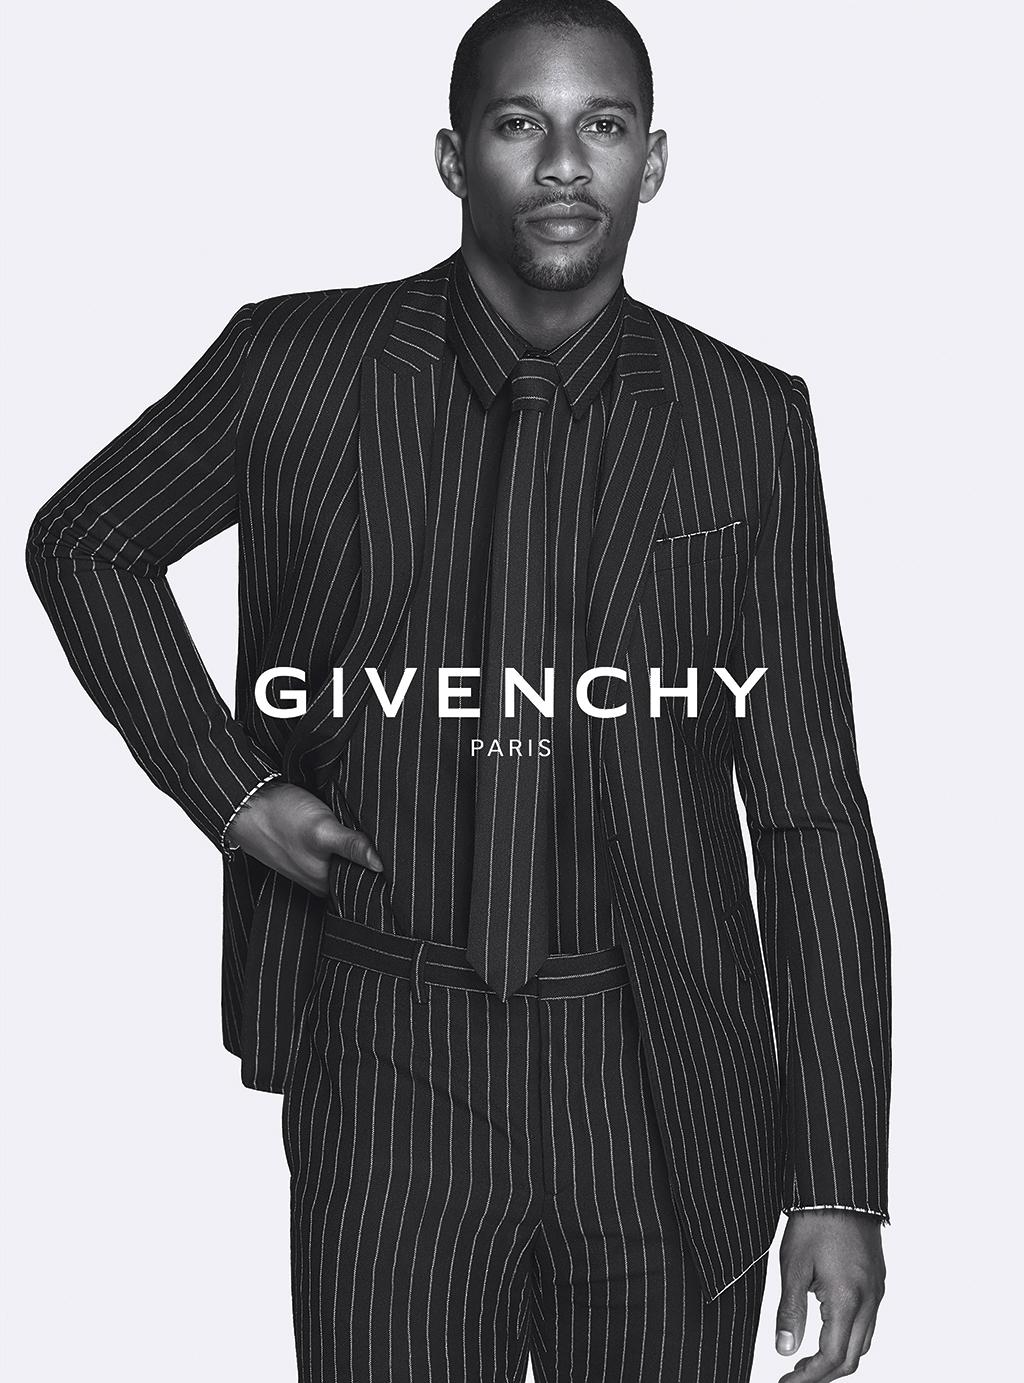 Givenchy-Fall-Winter-2015-Campaign-Victor-Cruz